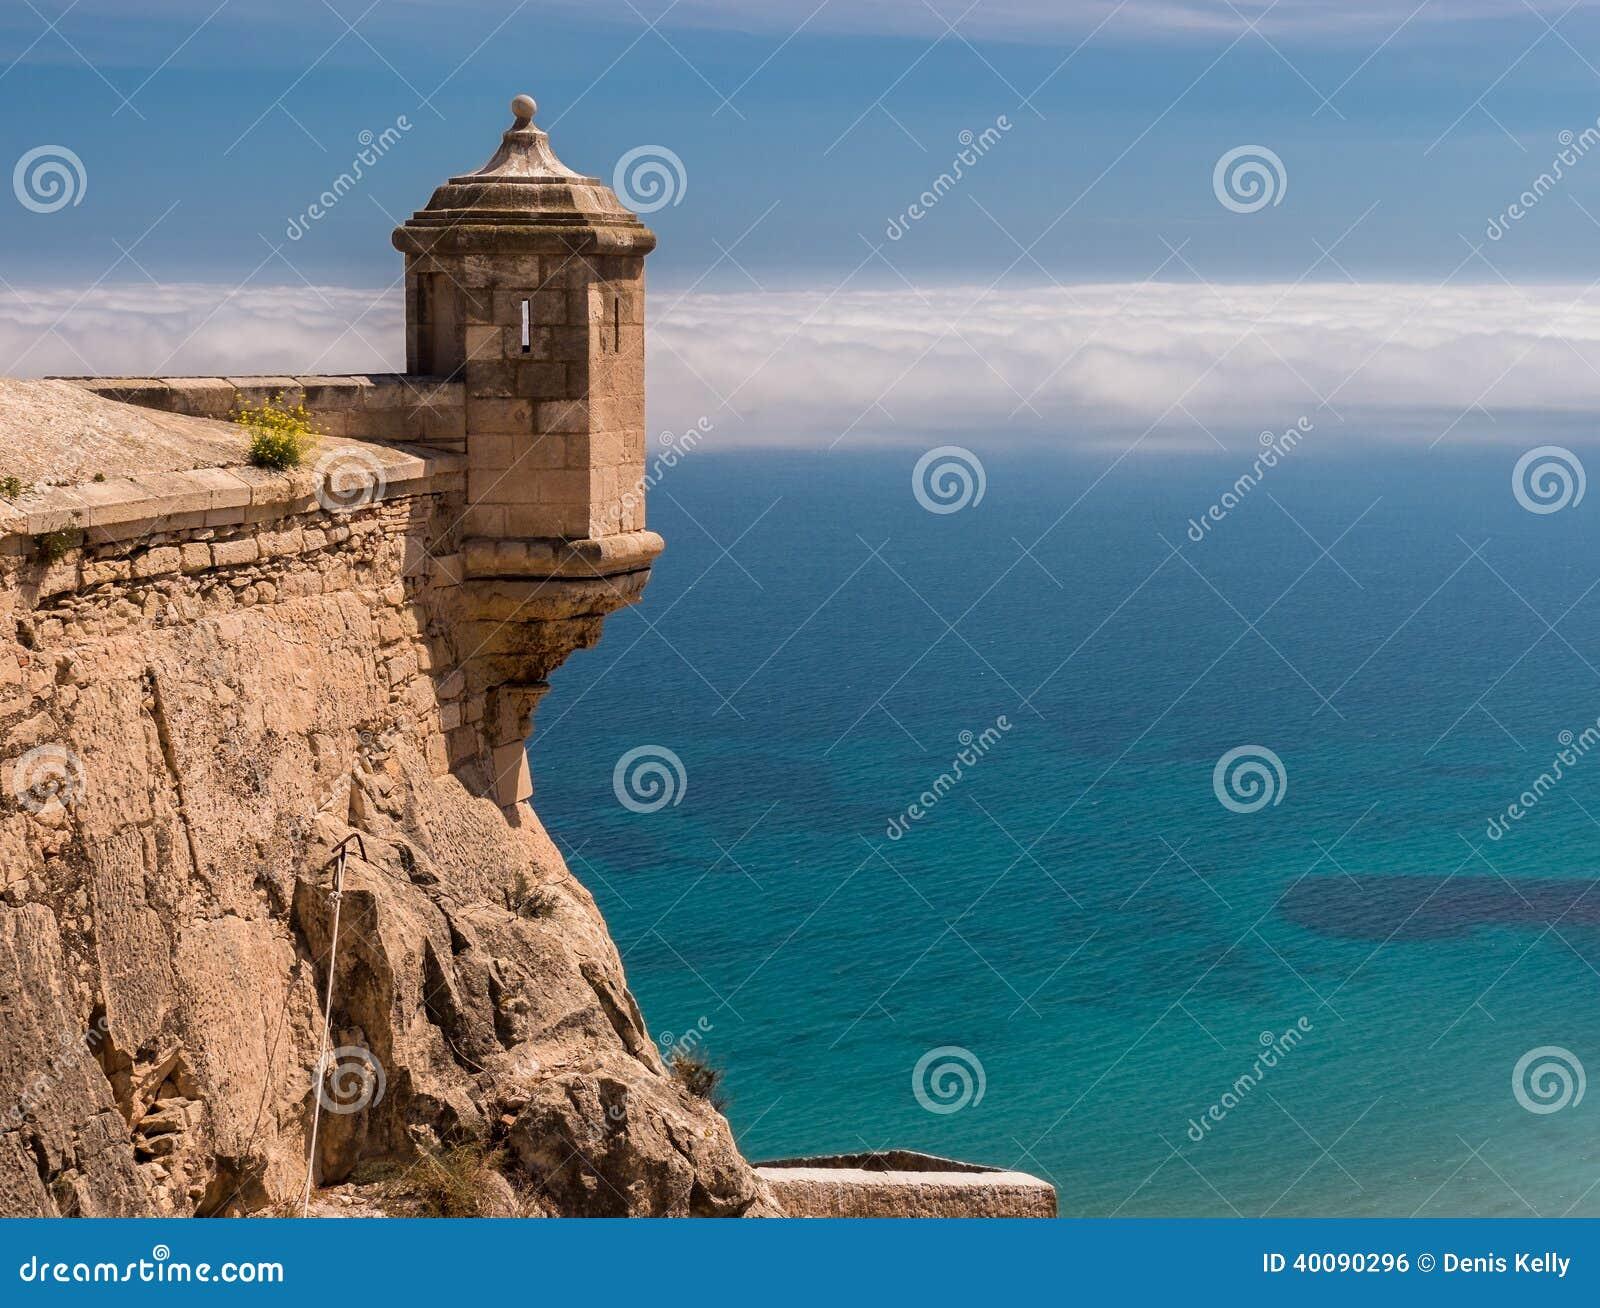 Santa Barbara kasztel w Alicante, Hiszpania